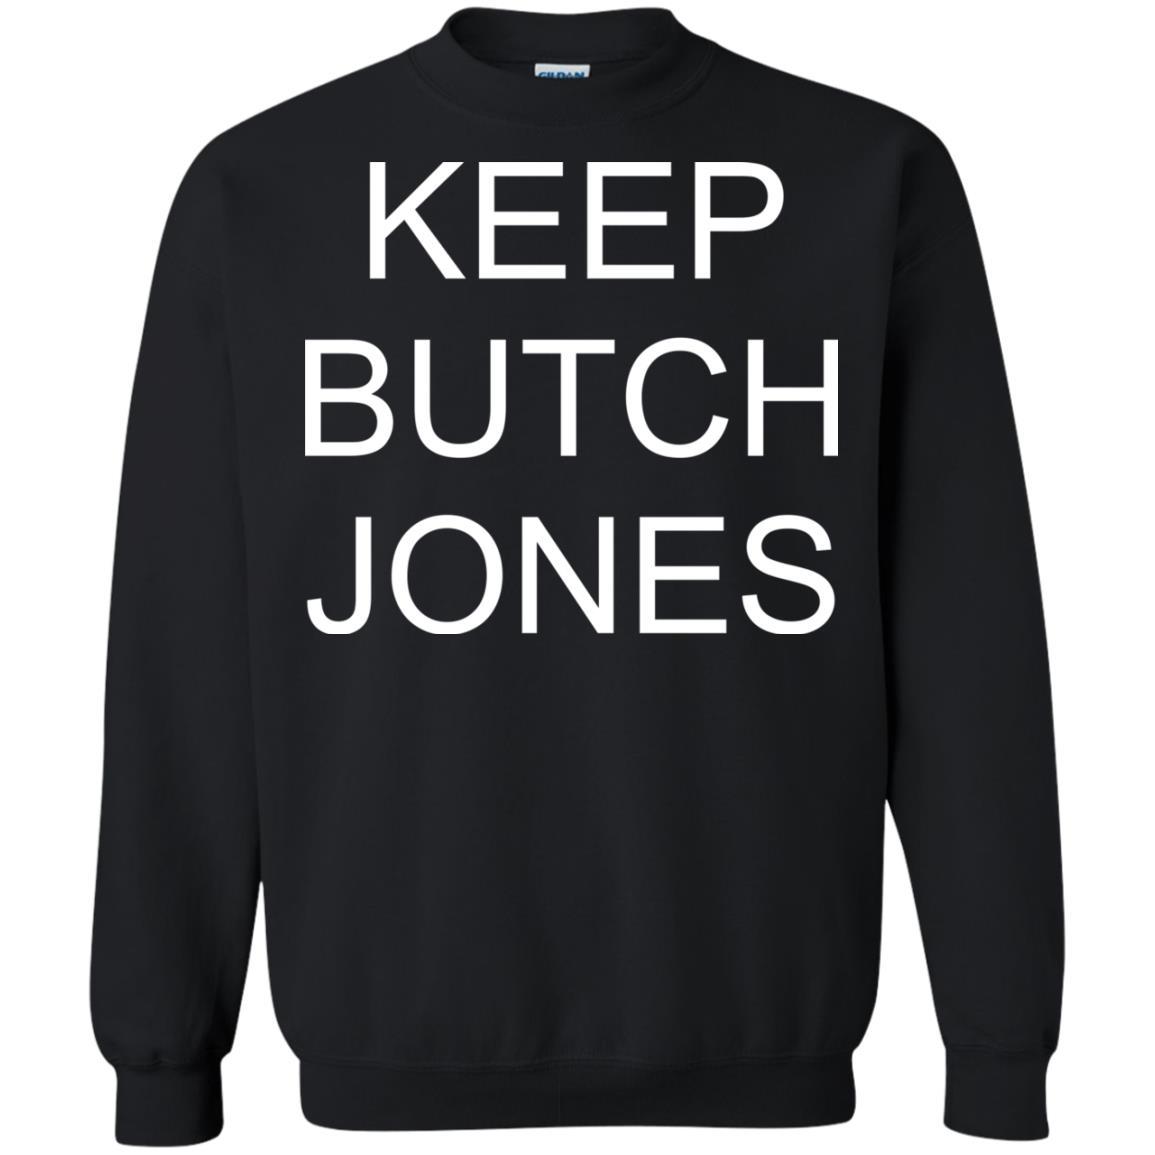 image 1435 - Keep Butch Jones shirt, sweater, long sleeve